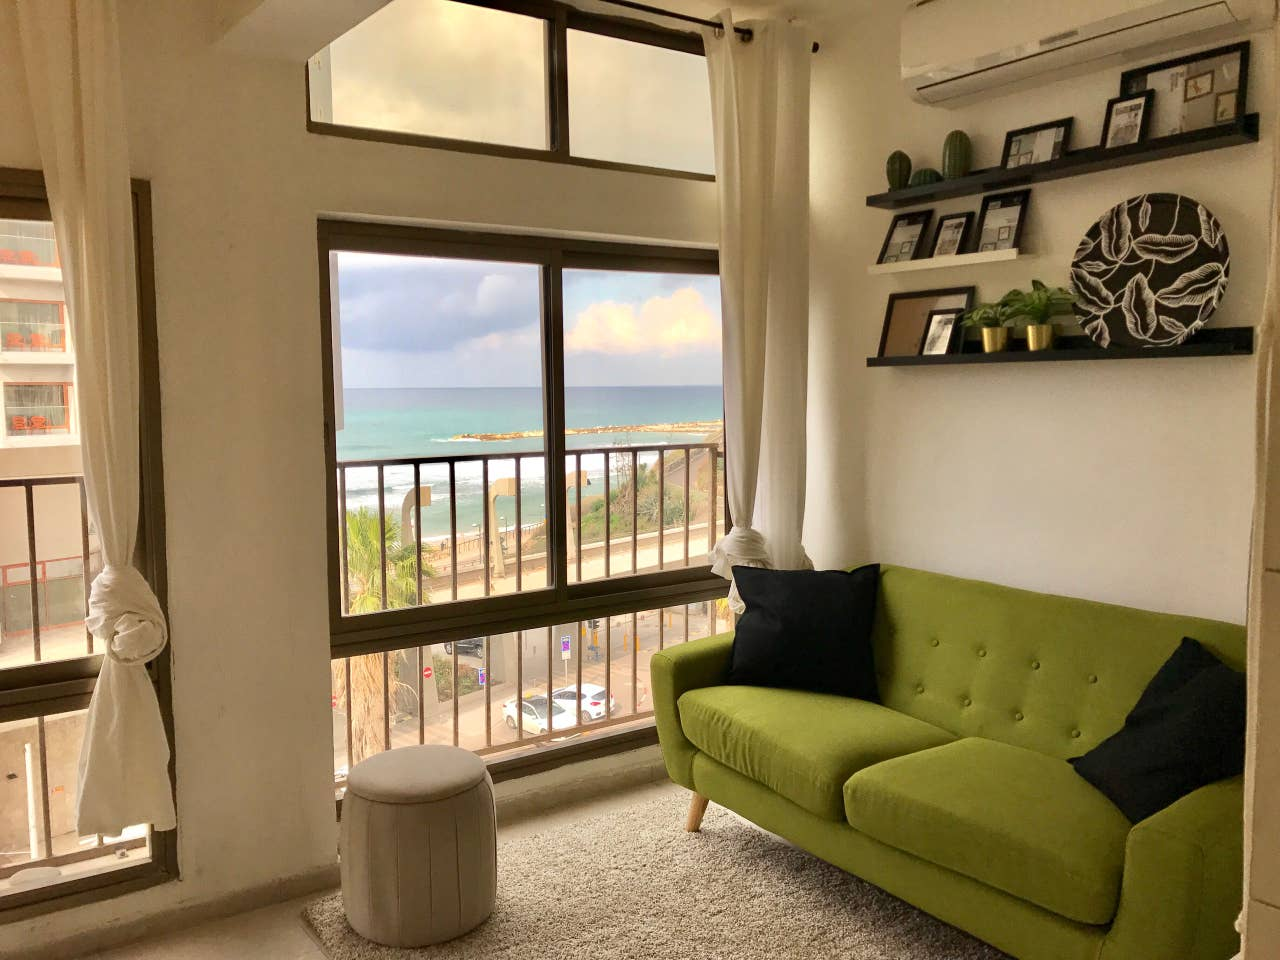 Apartment Sea View 2 bedroom Apartment Tel Aviv Hayarkon photo 26061653